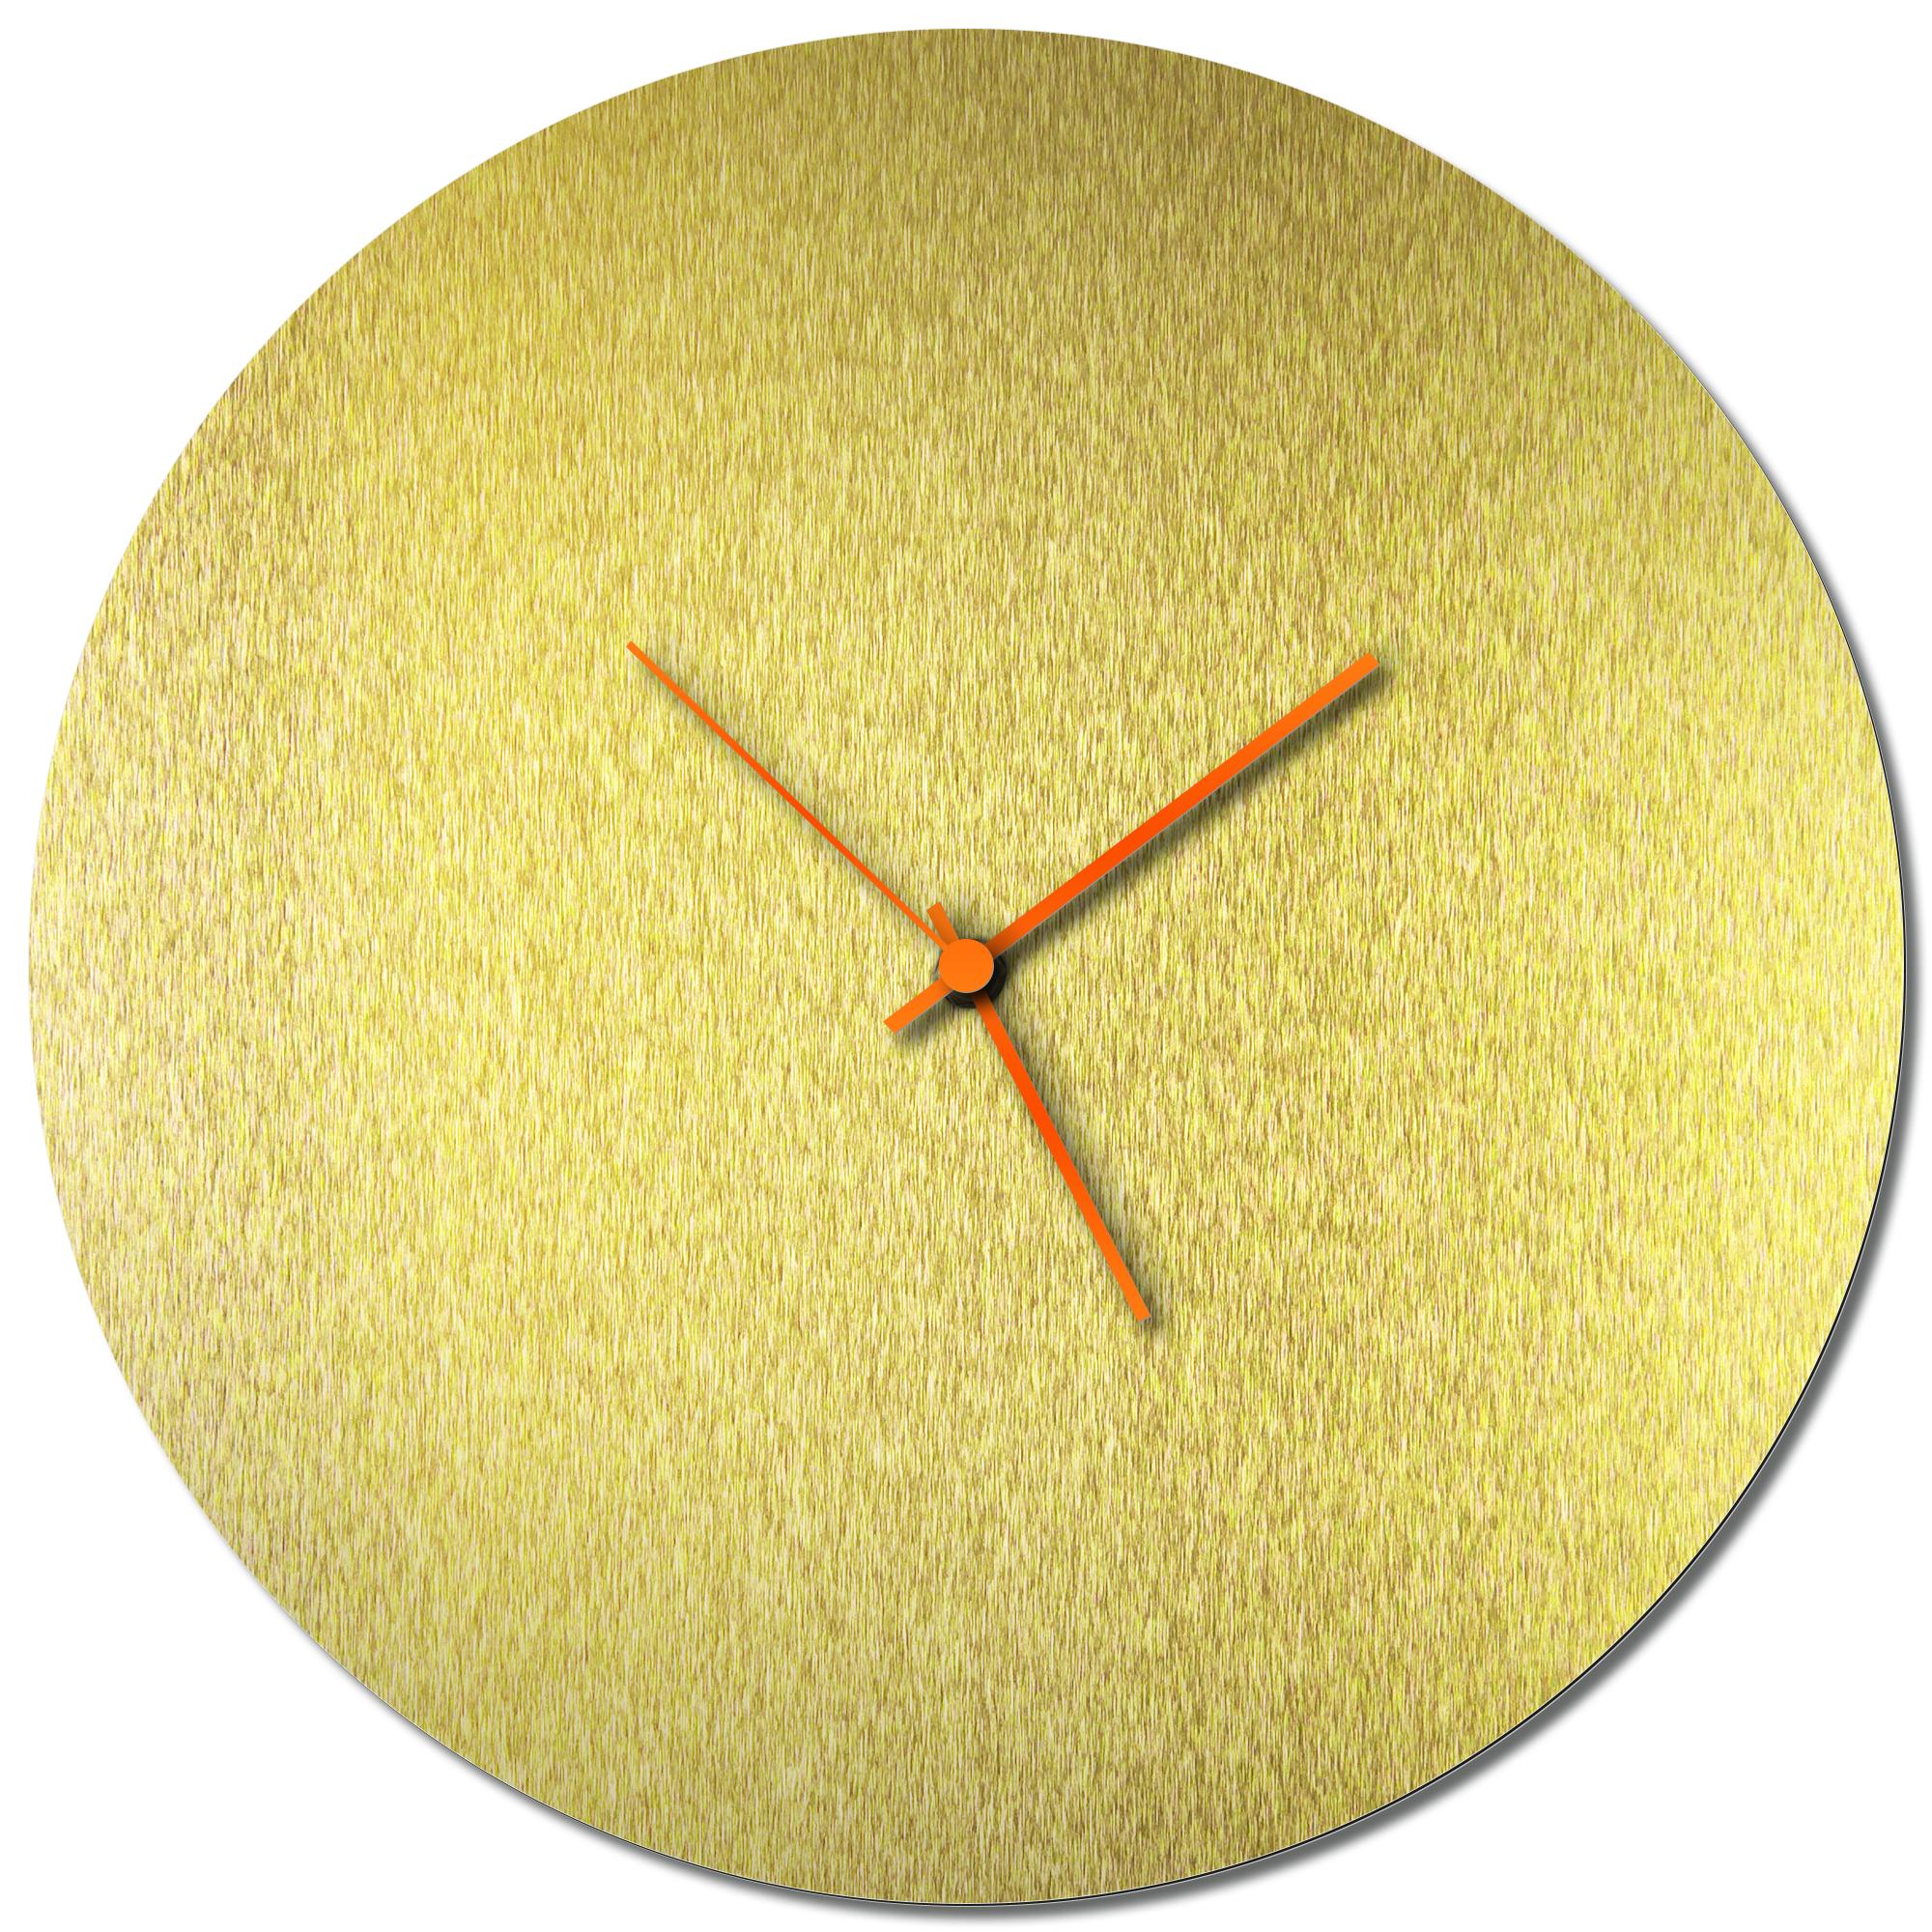 Adam Schwoeppe 'Goldsmith Circle Clock Orange' Midcentury Modern Style Wall Clock